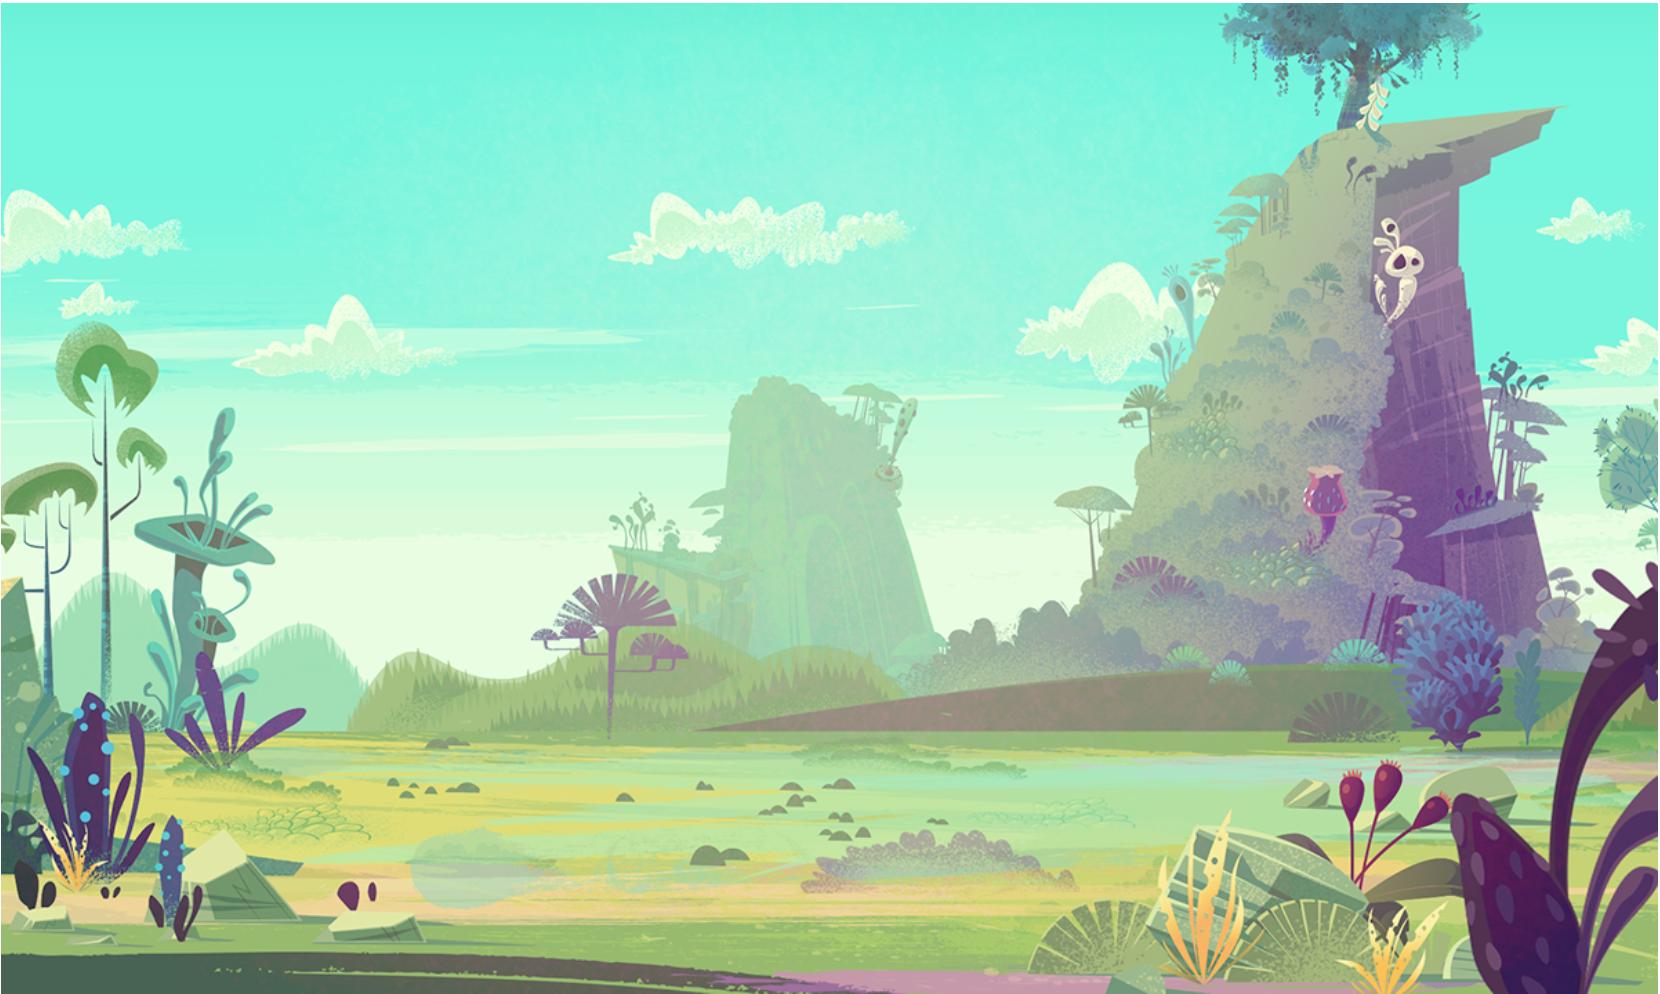 James Gilleard Cartoon Backgrounds Animation Background Cartoon Background Environment Concept Art